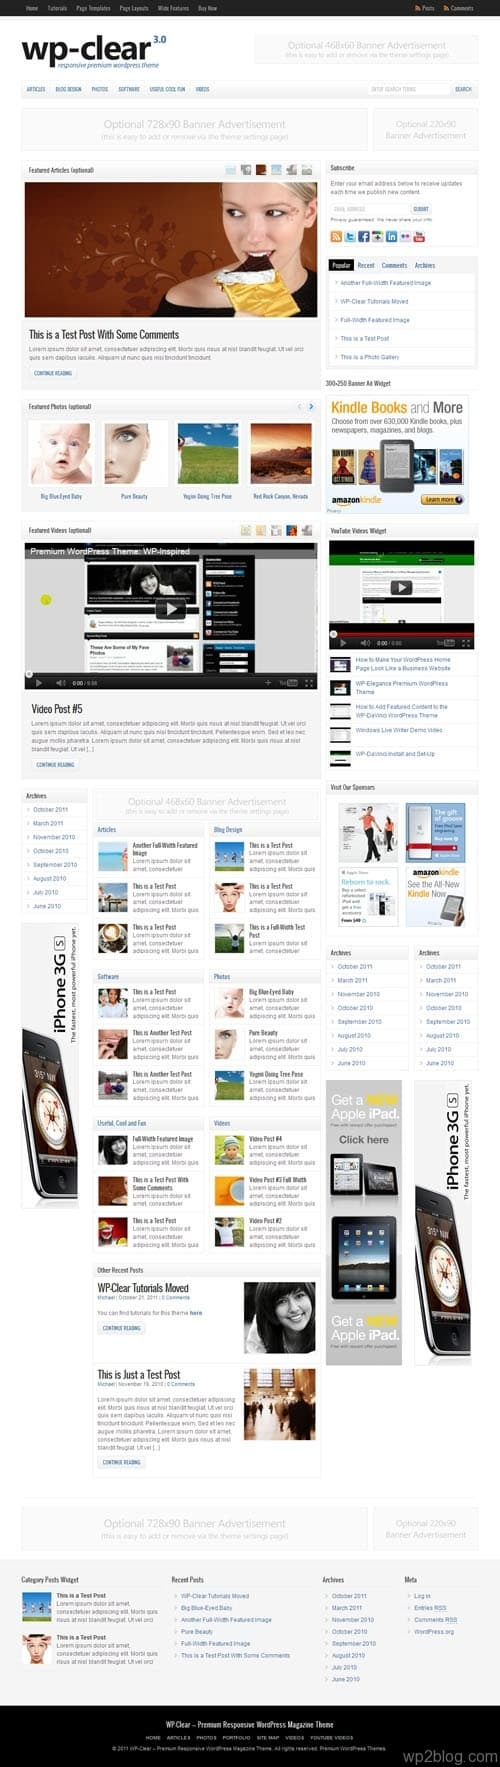 WP Clear 3.0 Premium WordPress Theme